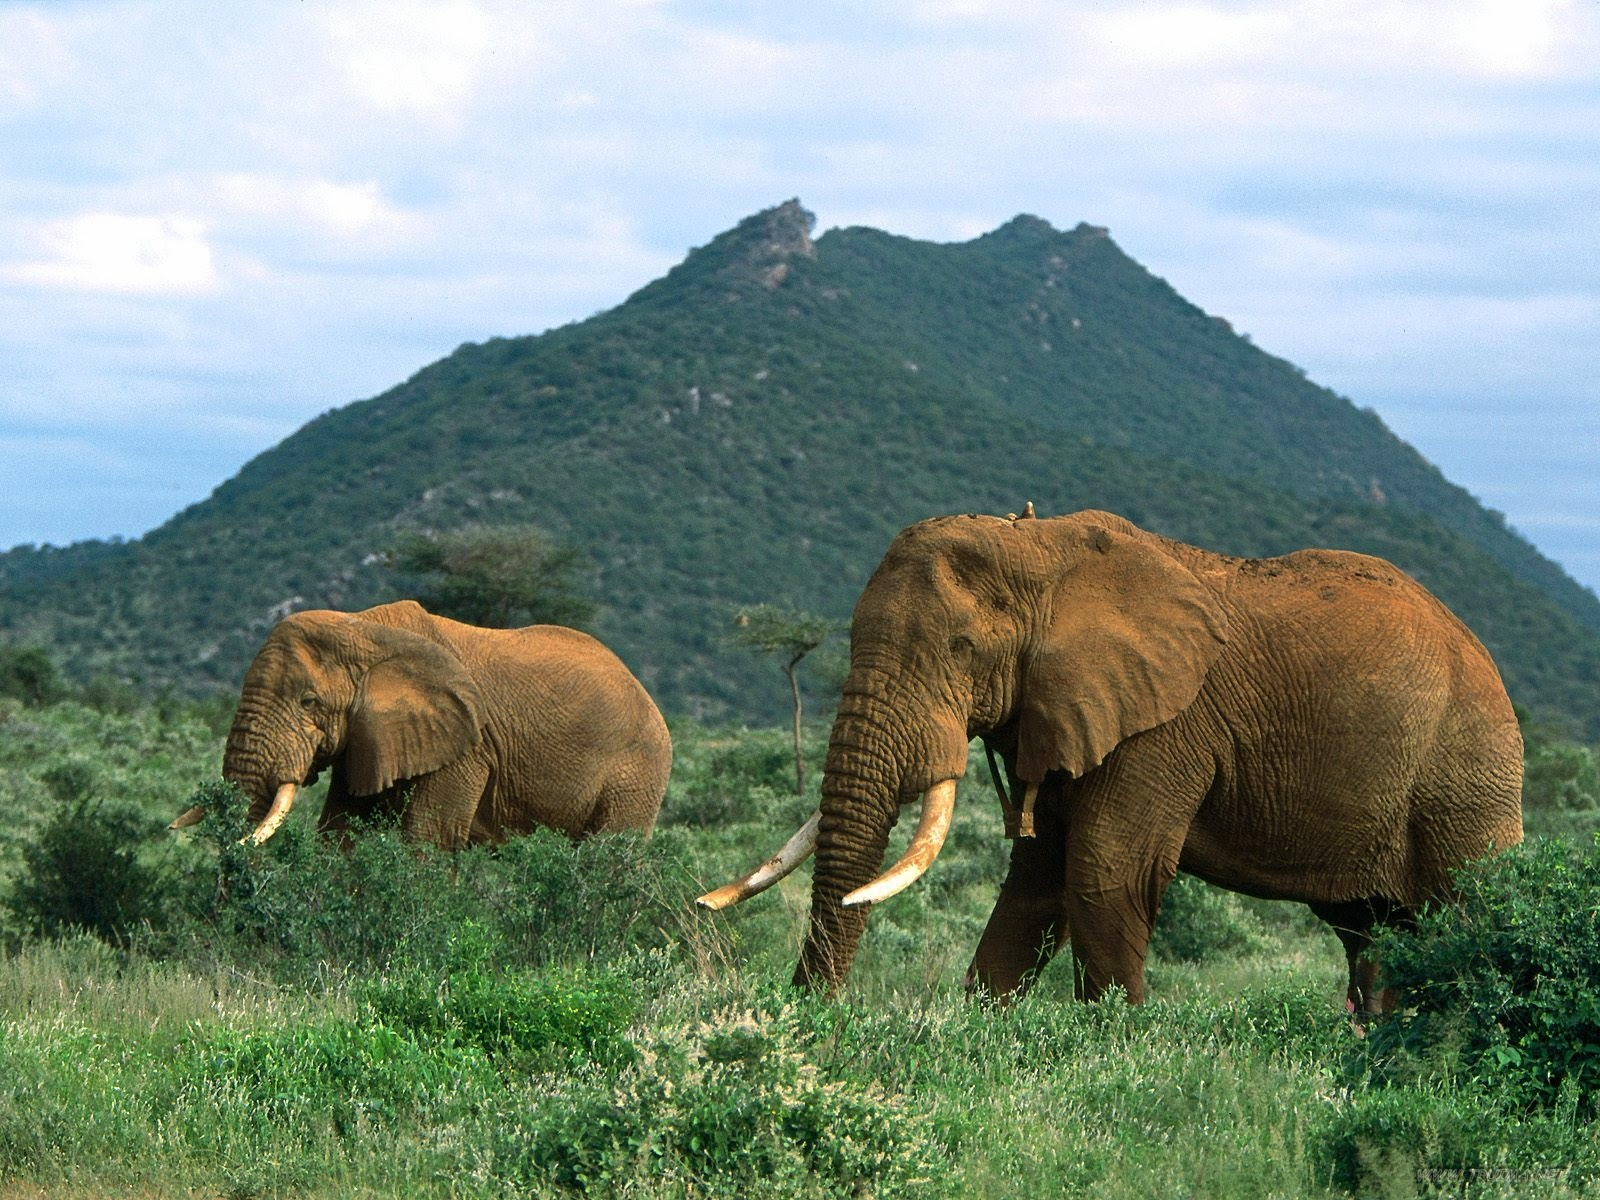 elephants wallpapers world - photo #4